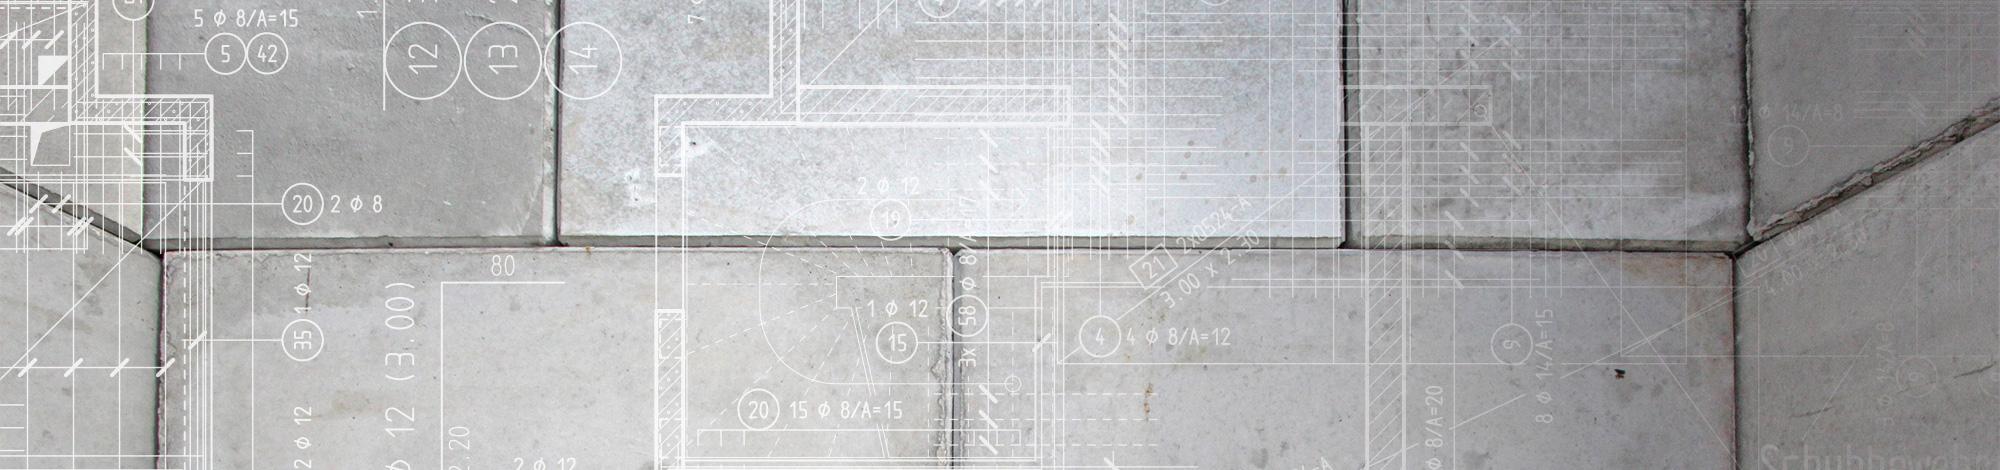 Kuttenkeuler Hennef innenarchitektur ingenieurbüro hennef bonn dipl ing lutz kuttenkeuler